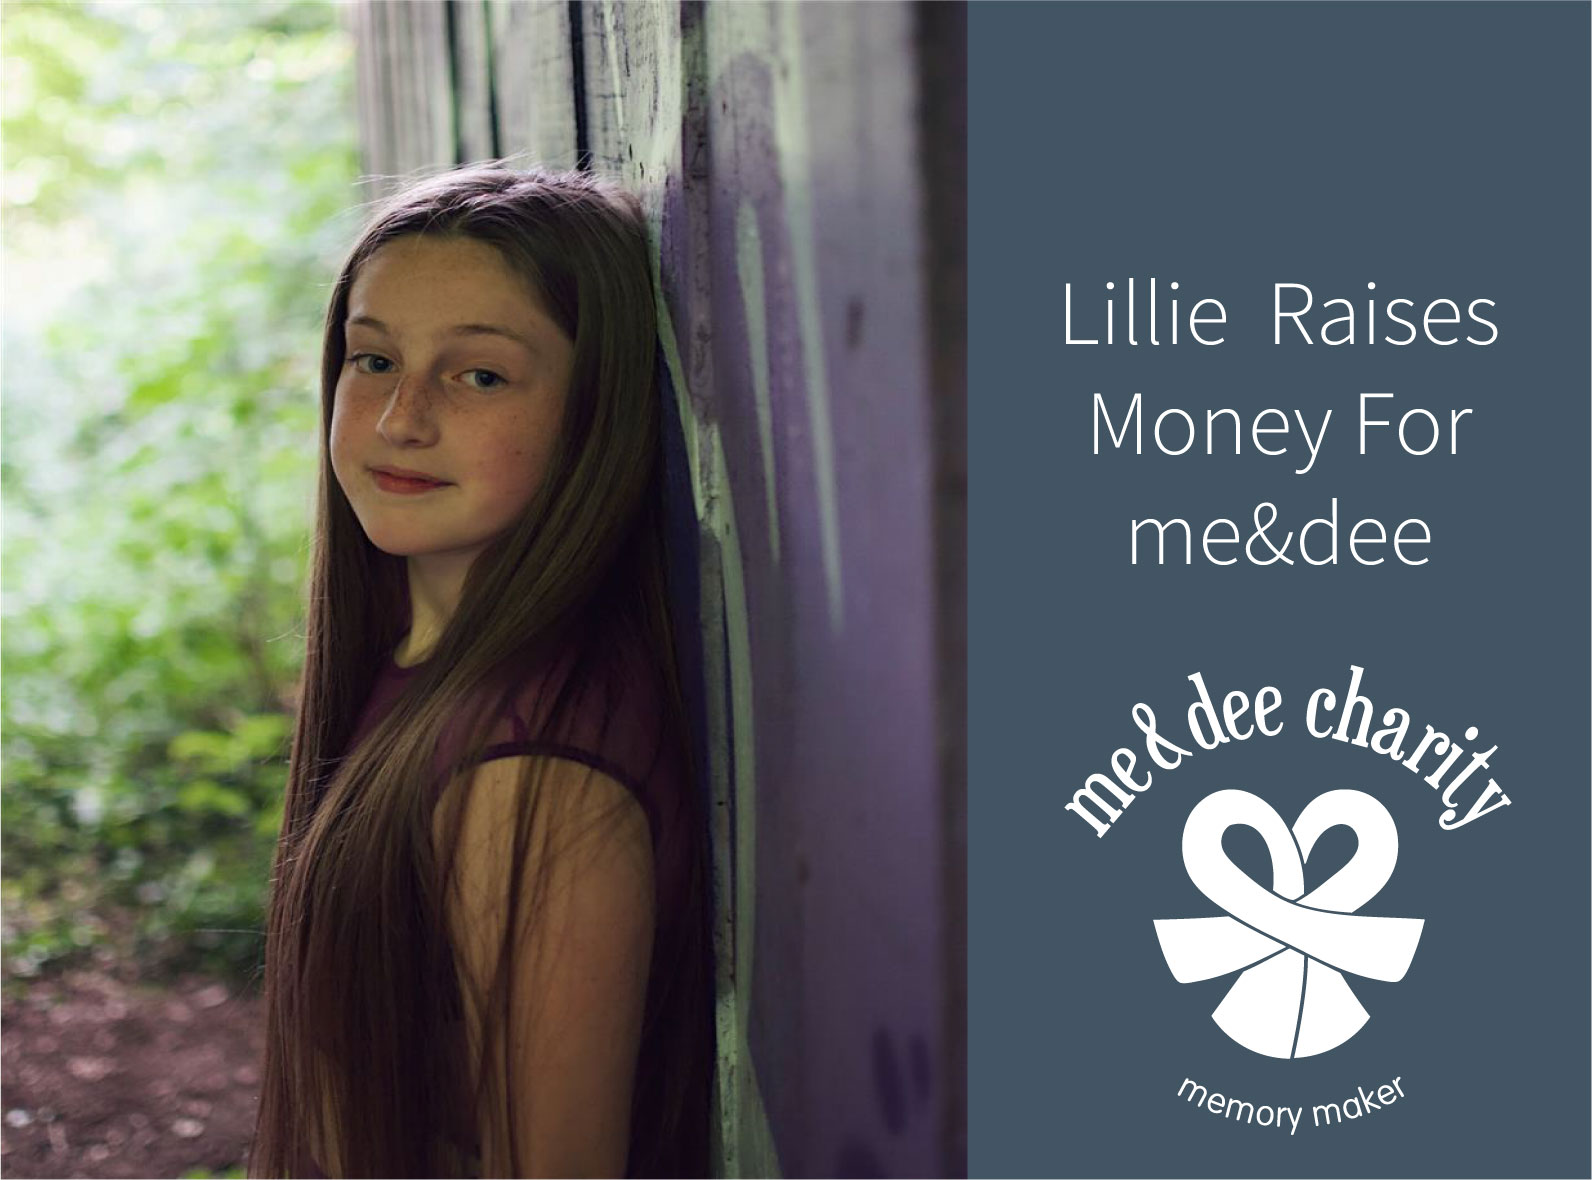 Lillie Donates, Twice!